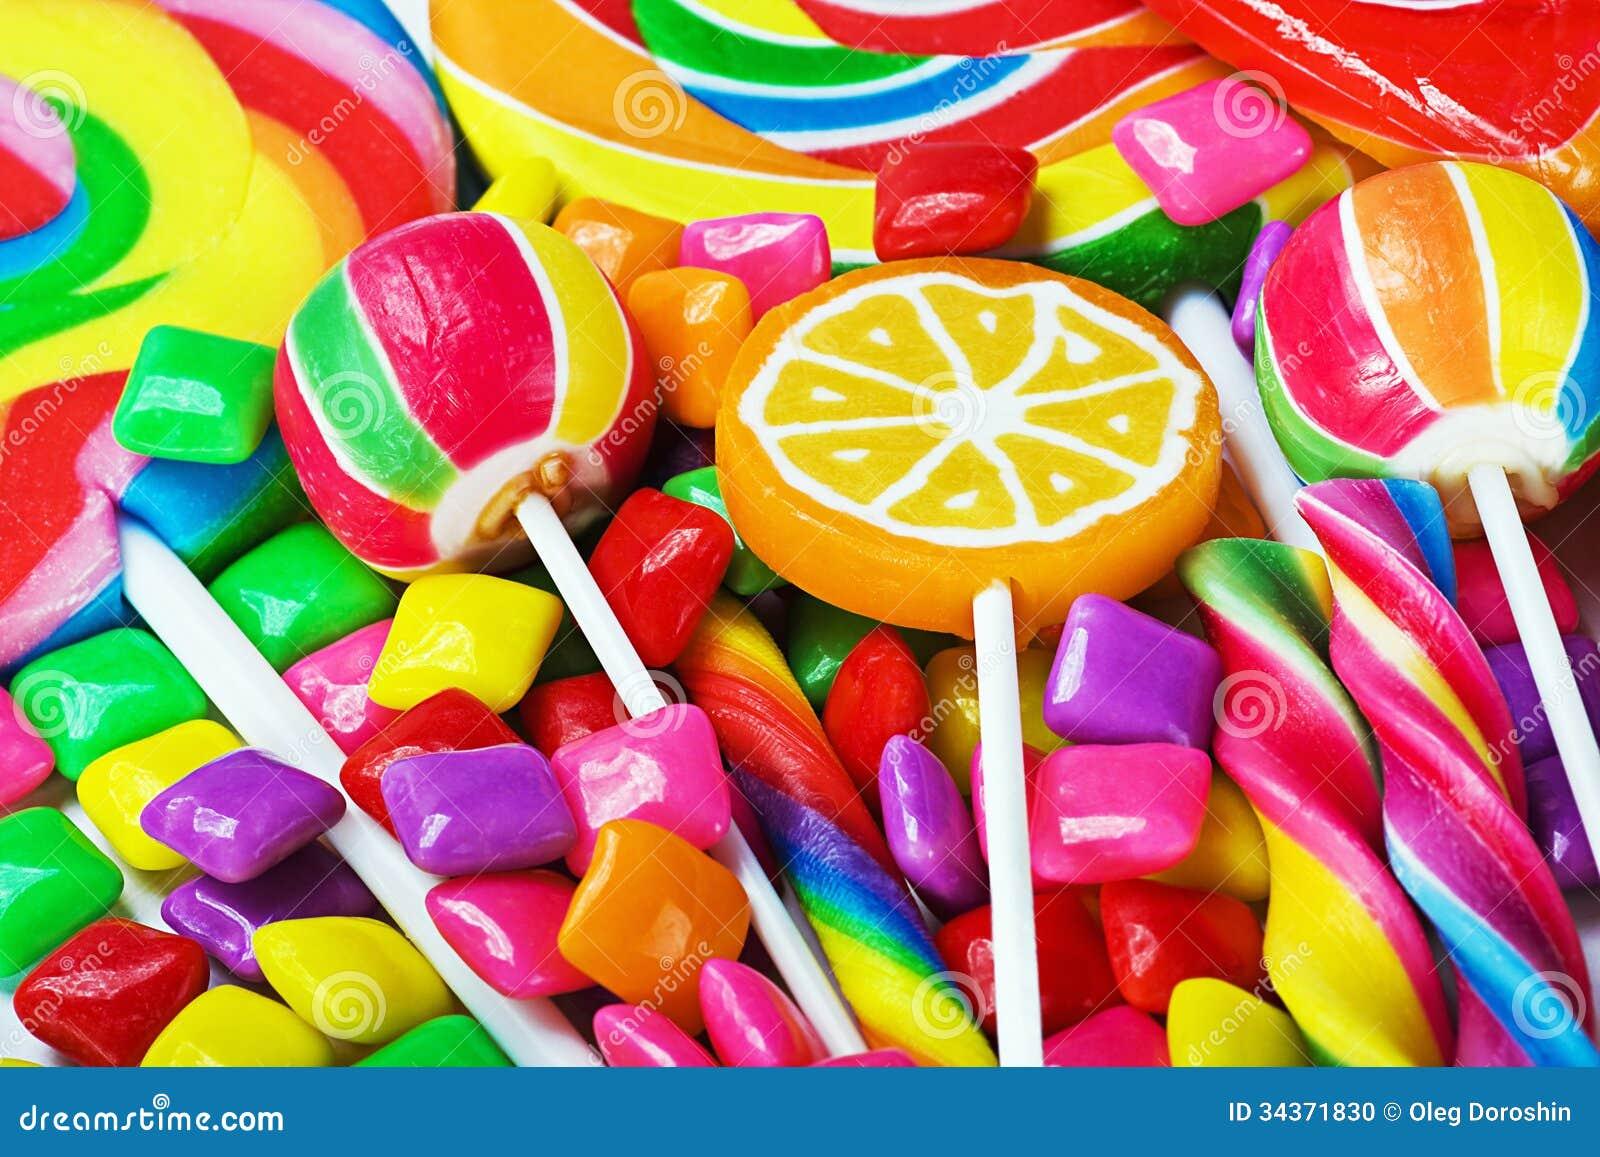 Multicolored lollys, suikergoed en kauwgom